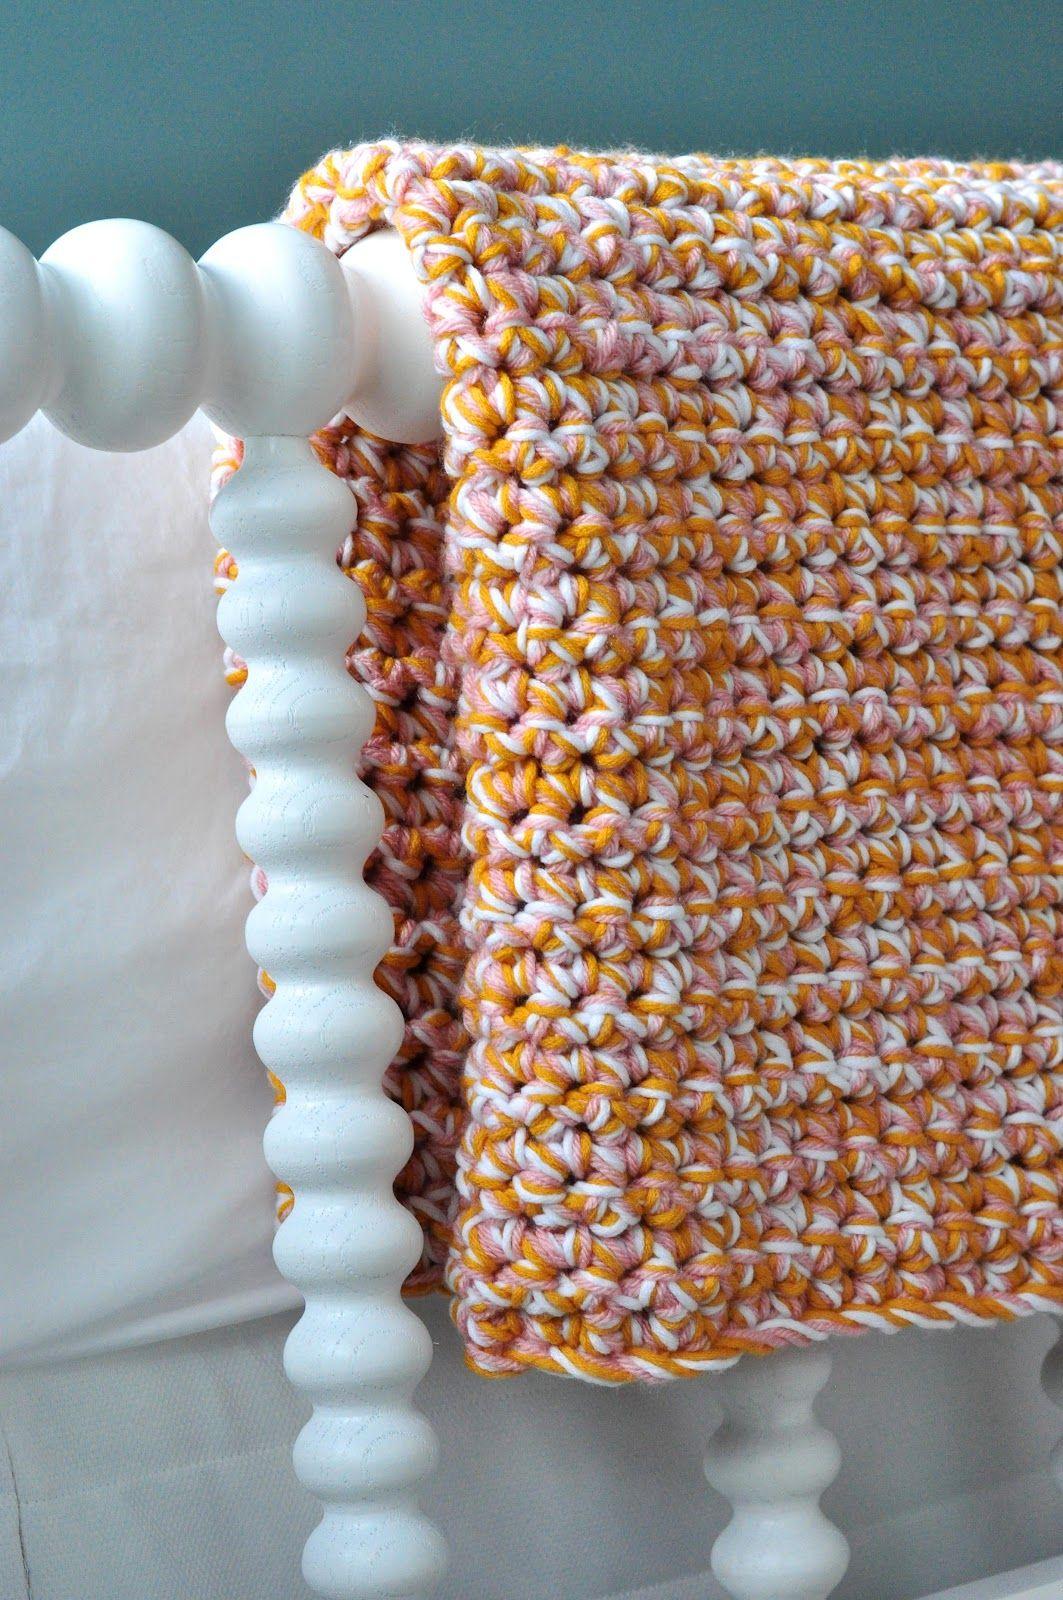 25 free baby blanket crochet patterns crochet pinterest baby aesthetic nest hoh in crochet easy baby afghan tutorial bankloansurffo Images